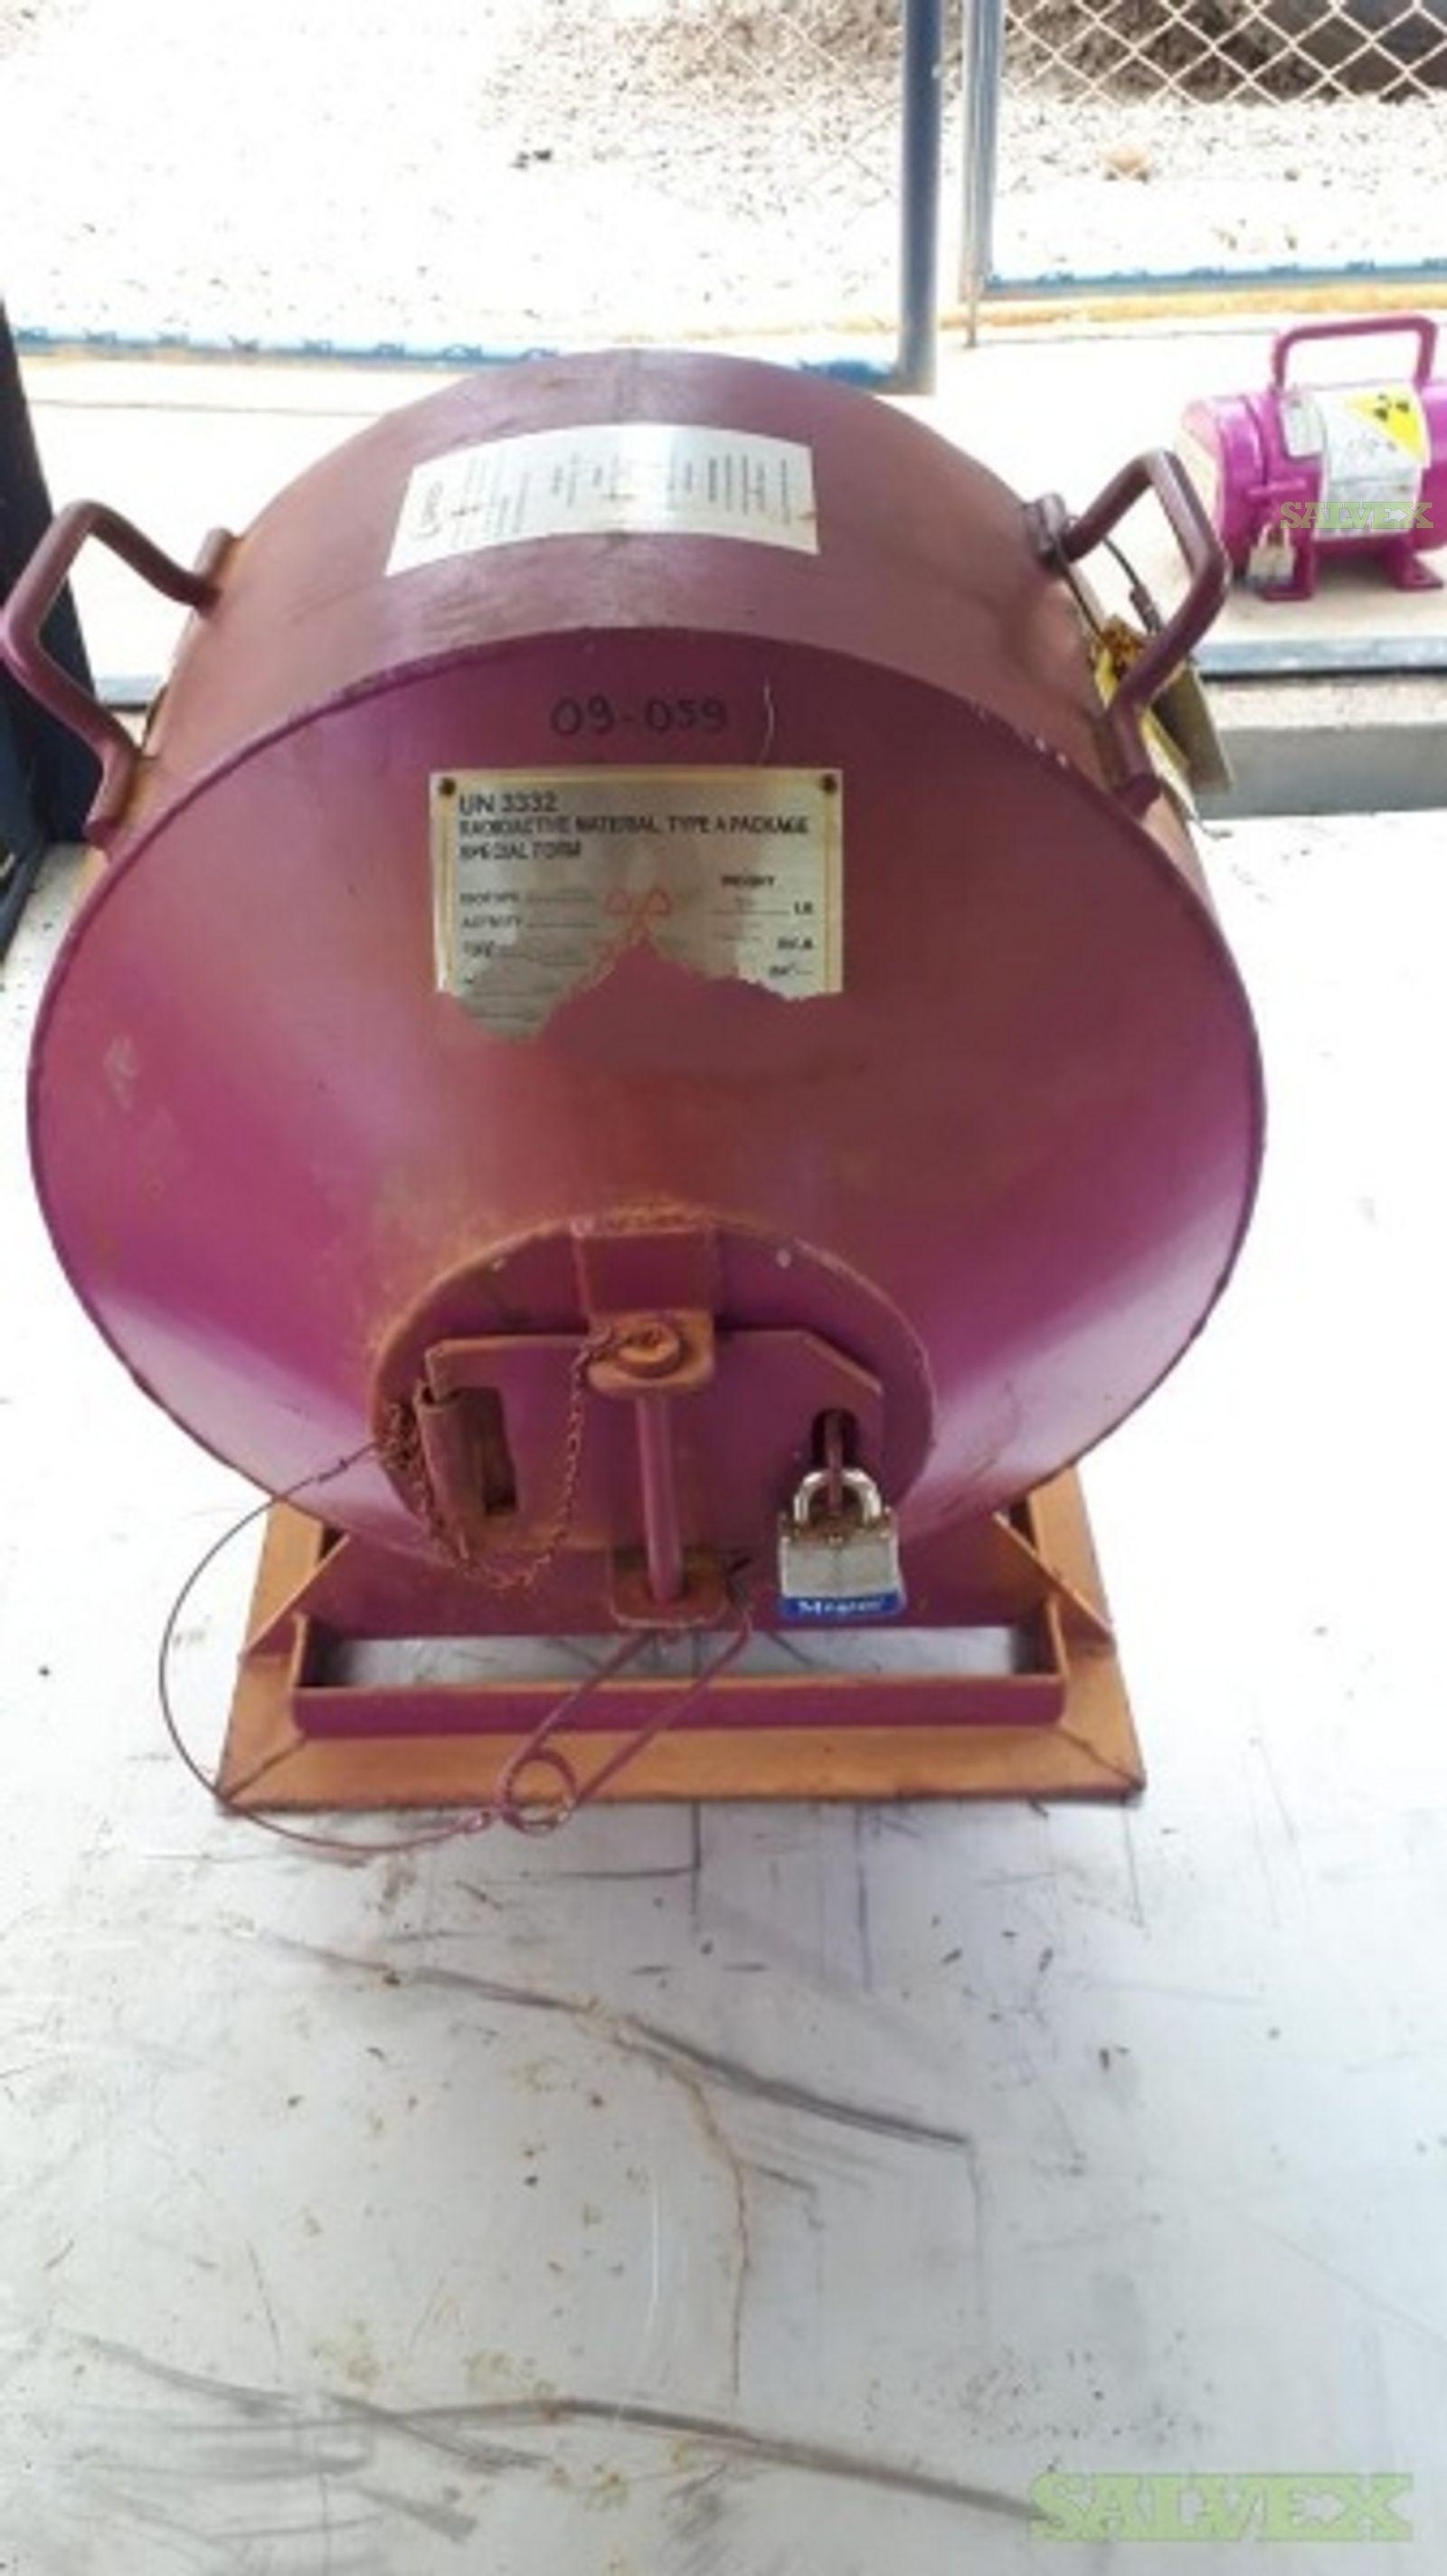 Open Hole Equipment / Probe Tools (113 Items)